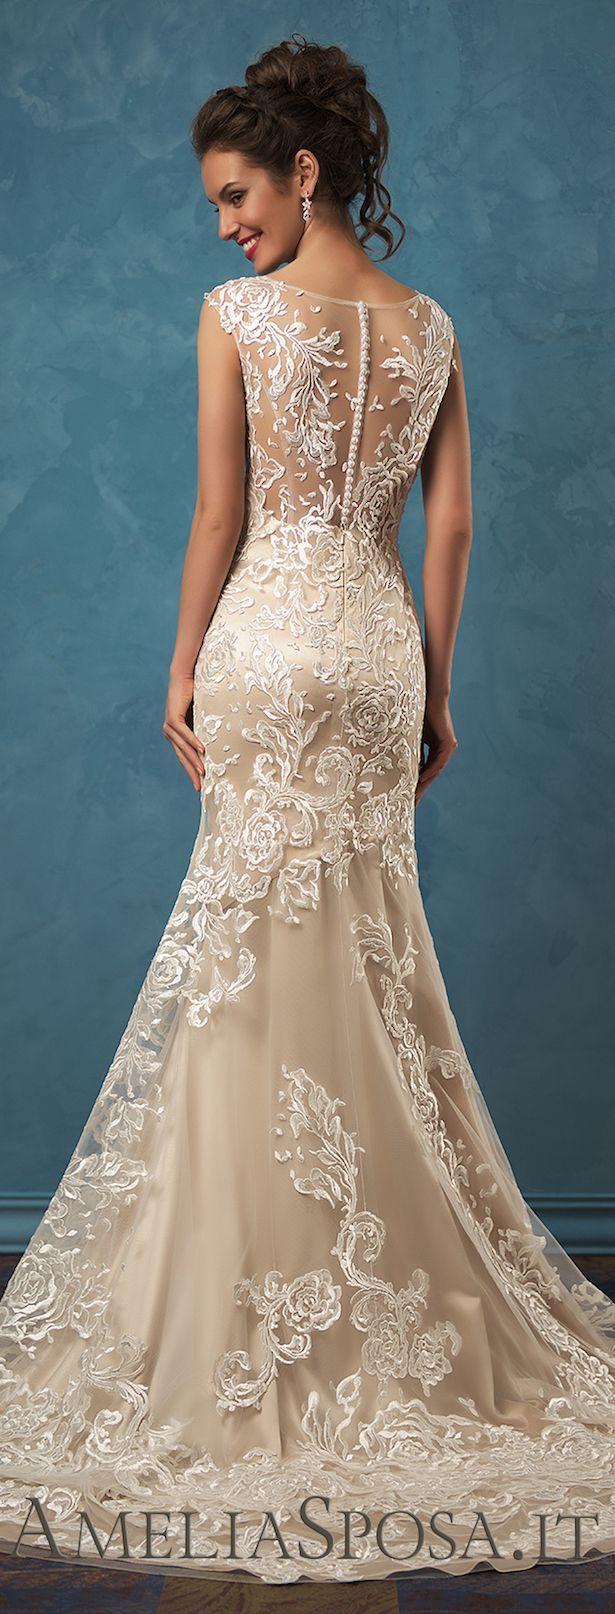 Wedding Dresses Paradise Amelia Sposa 2017 Wedding Dress